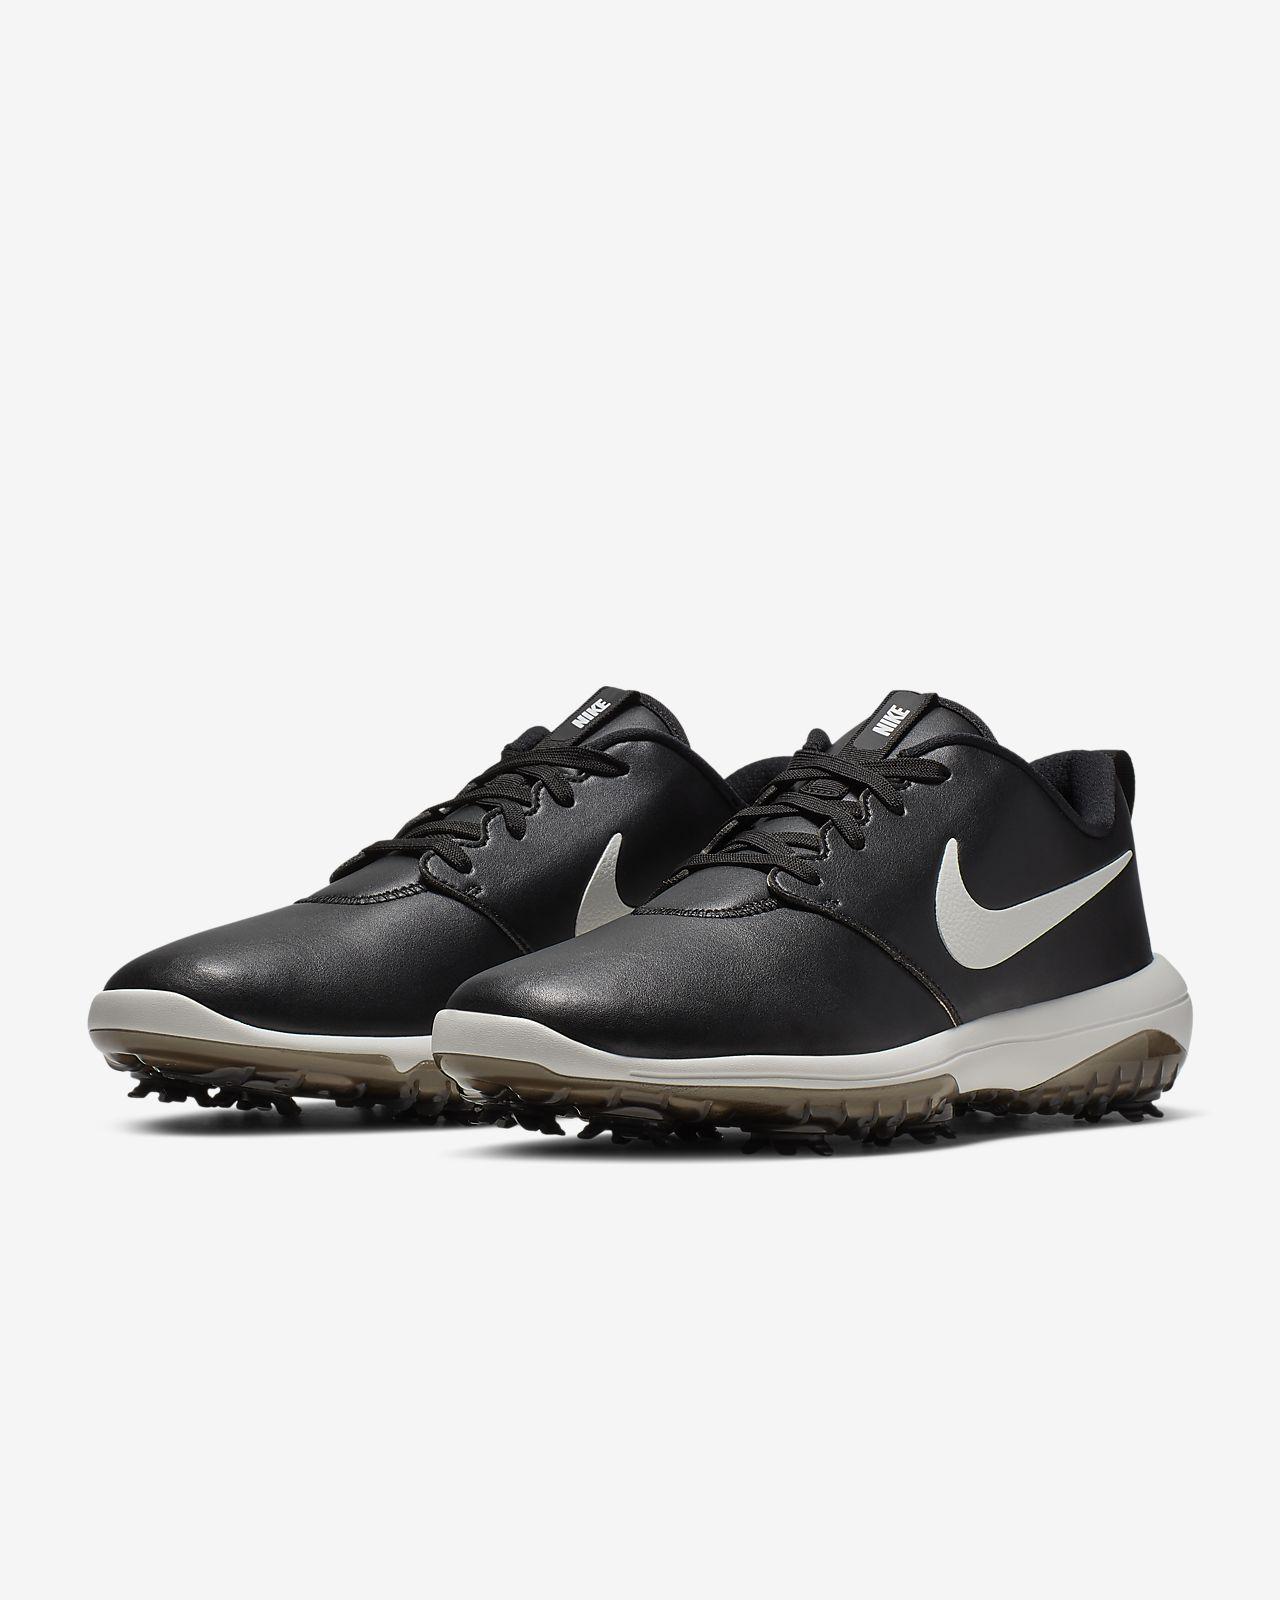 f3b5a97fba2 Nike Roshe G Tour Golfschoen voor heren. Nike.com BE